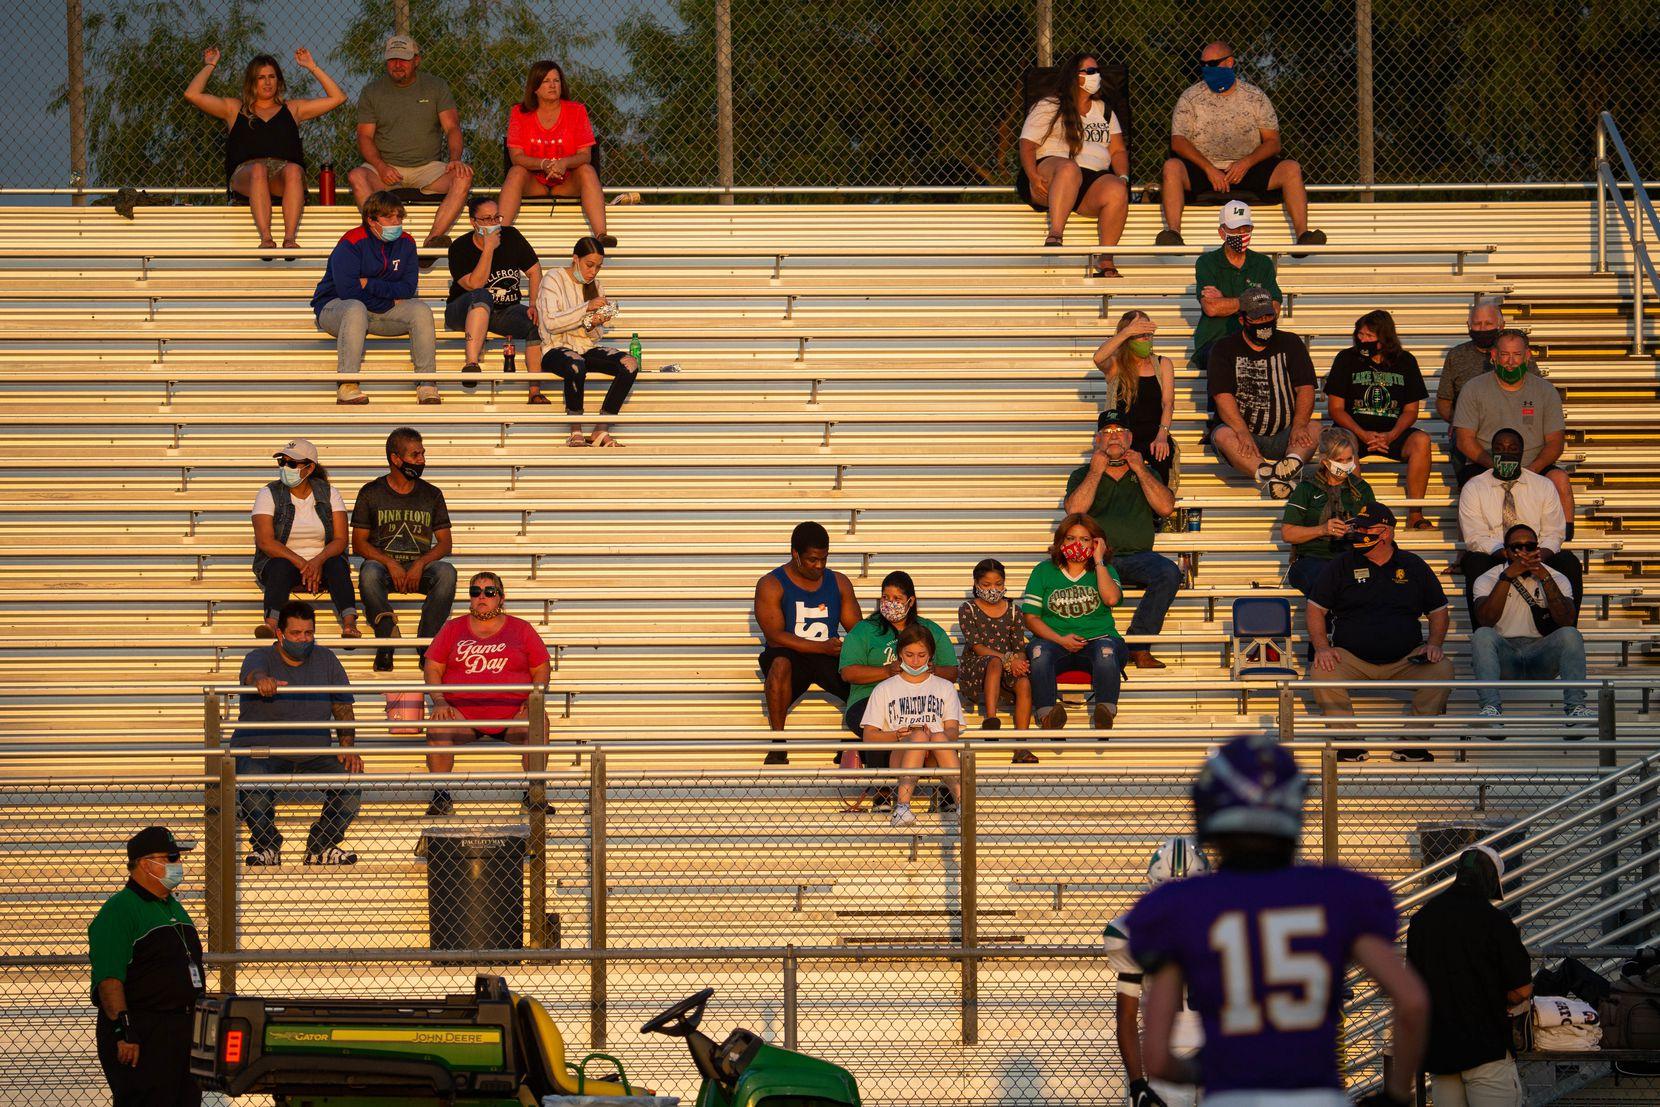 Lake Worth High School Fans wait for start of a game against Sanger on Sept. 4, 2020 in Sanger. Sanger leads 26-14 at halftime. (Juan Figueroa/ The Dallas Morning News)